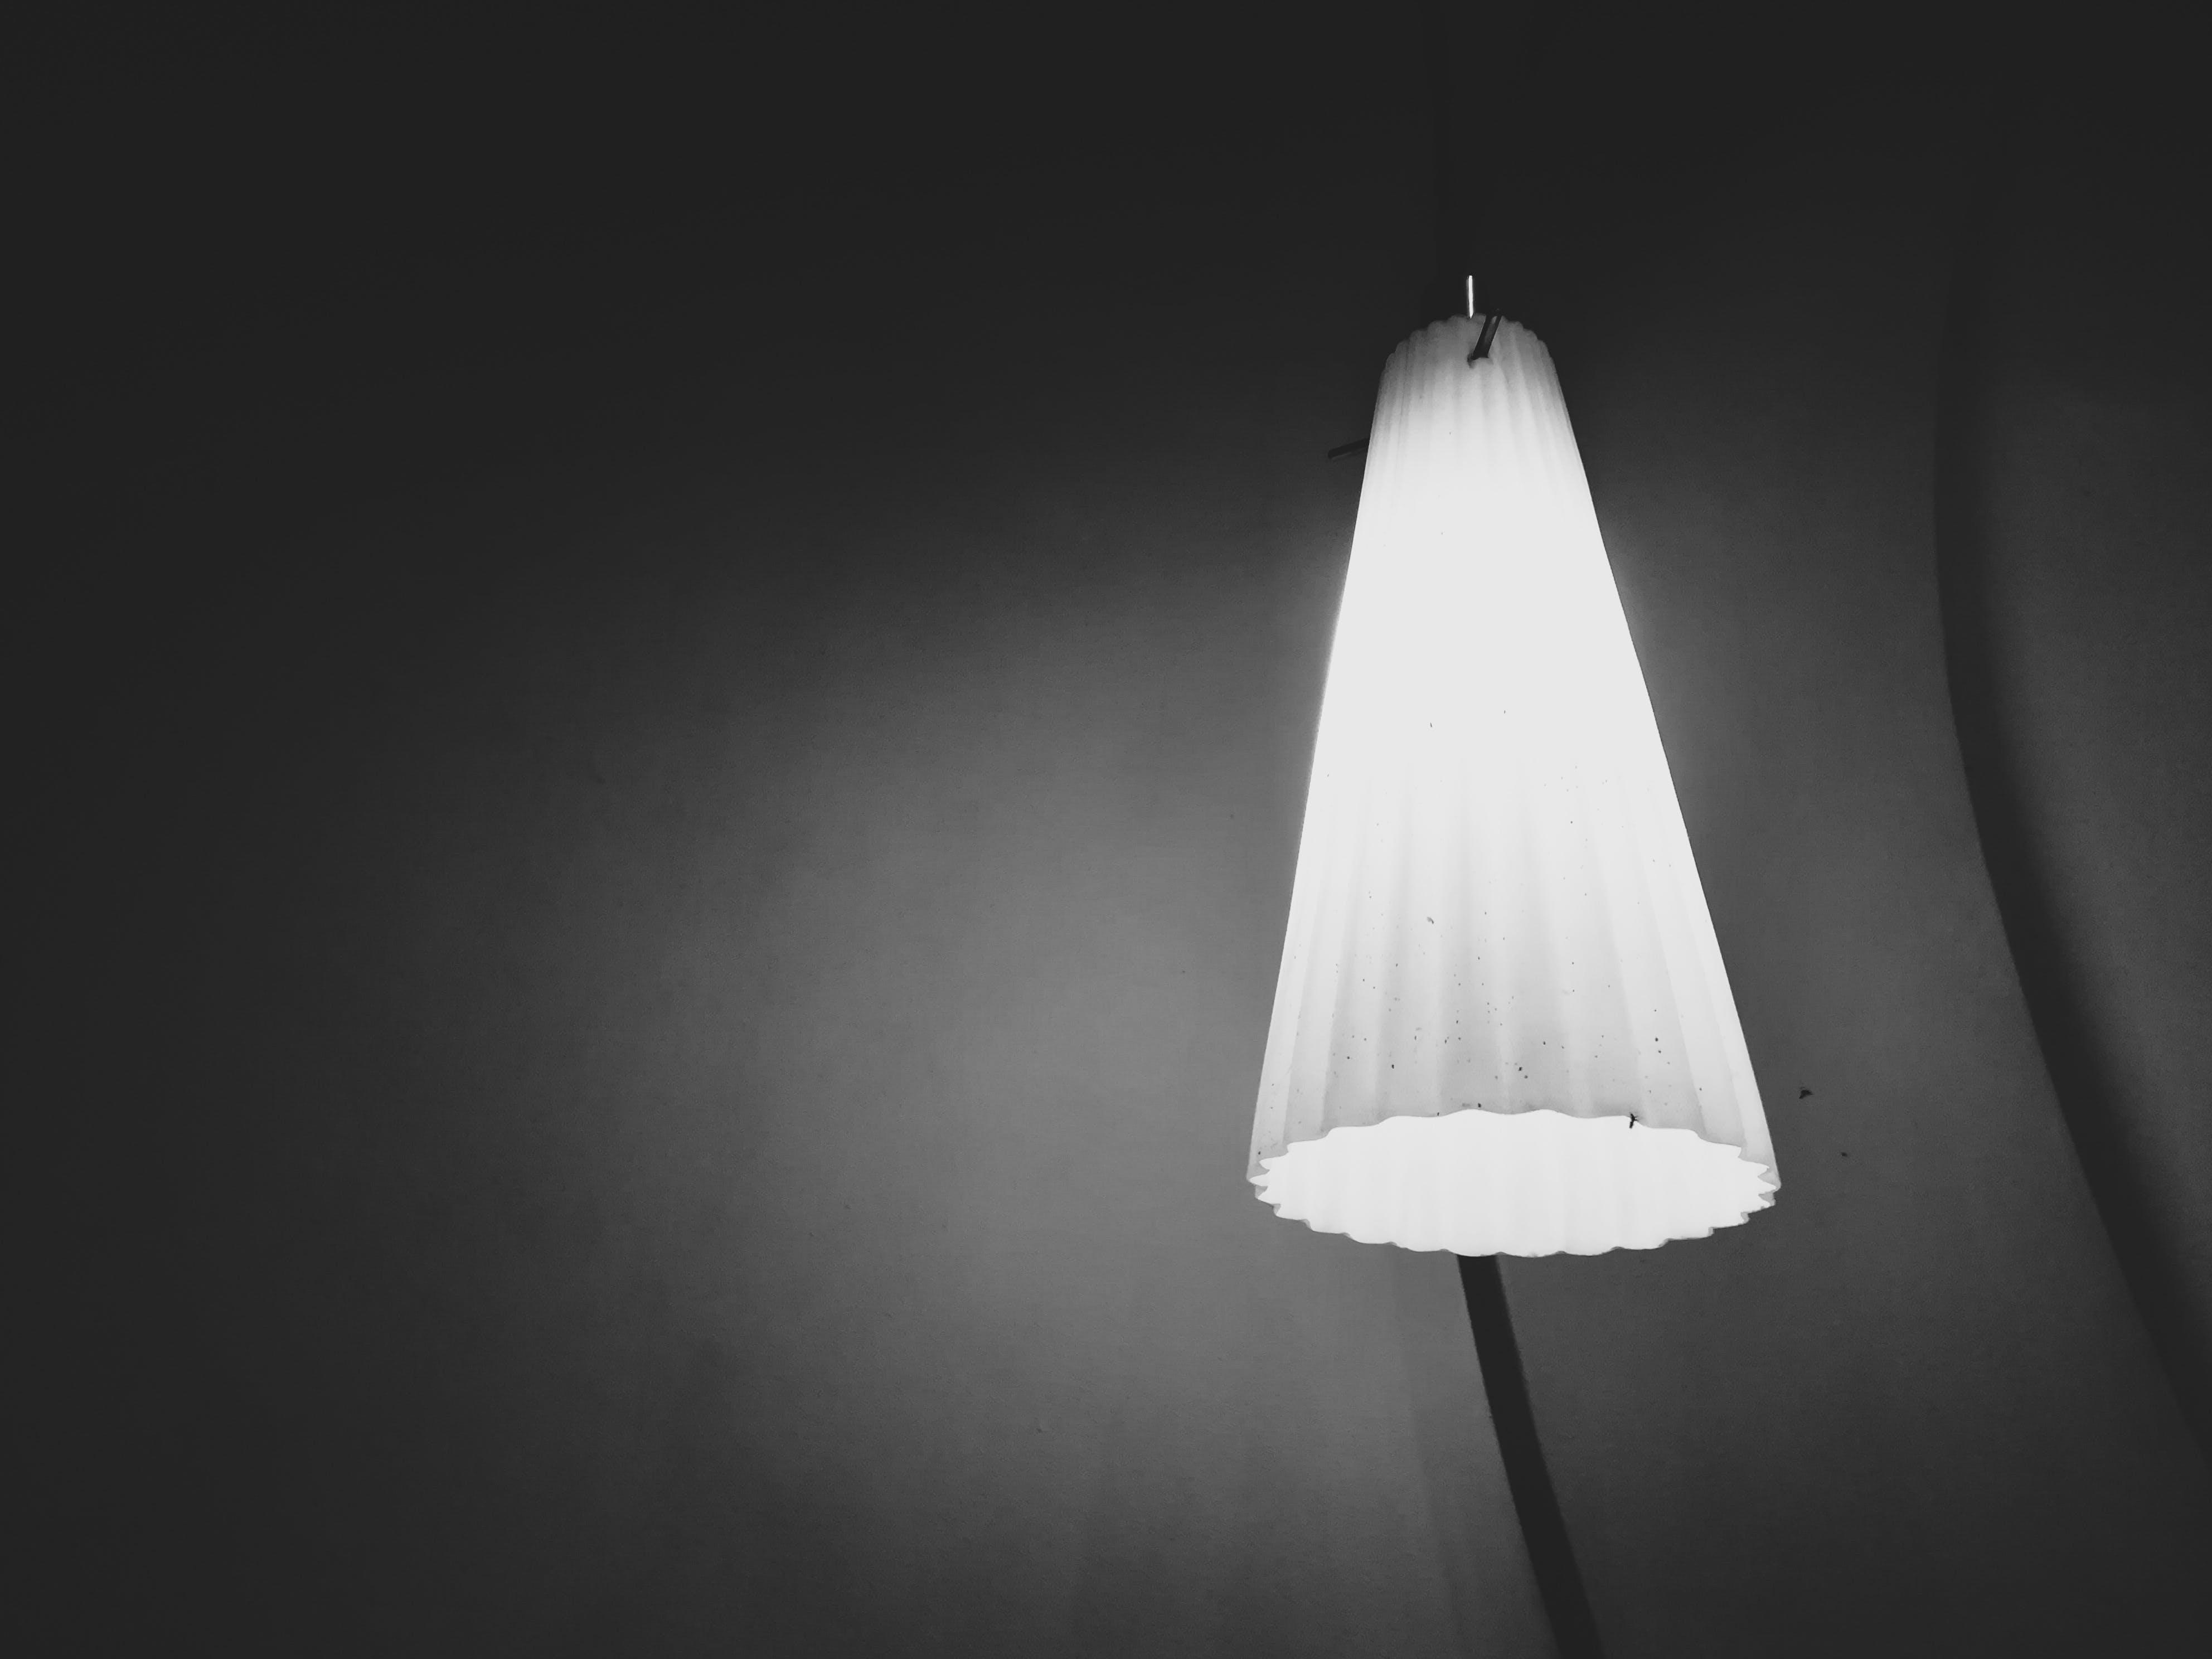 Free stock photo of black and white, bulb, ceiling lamp, dark